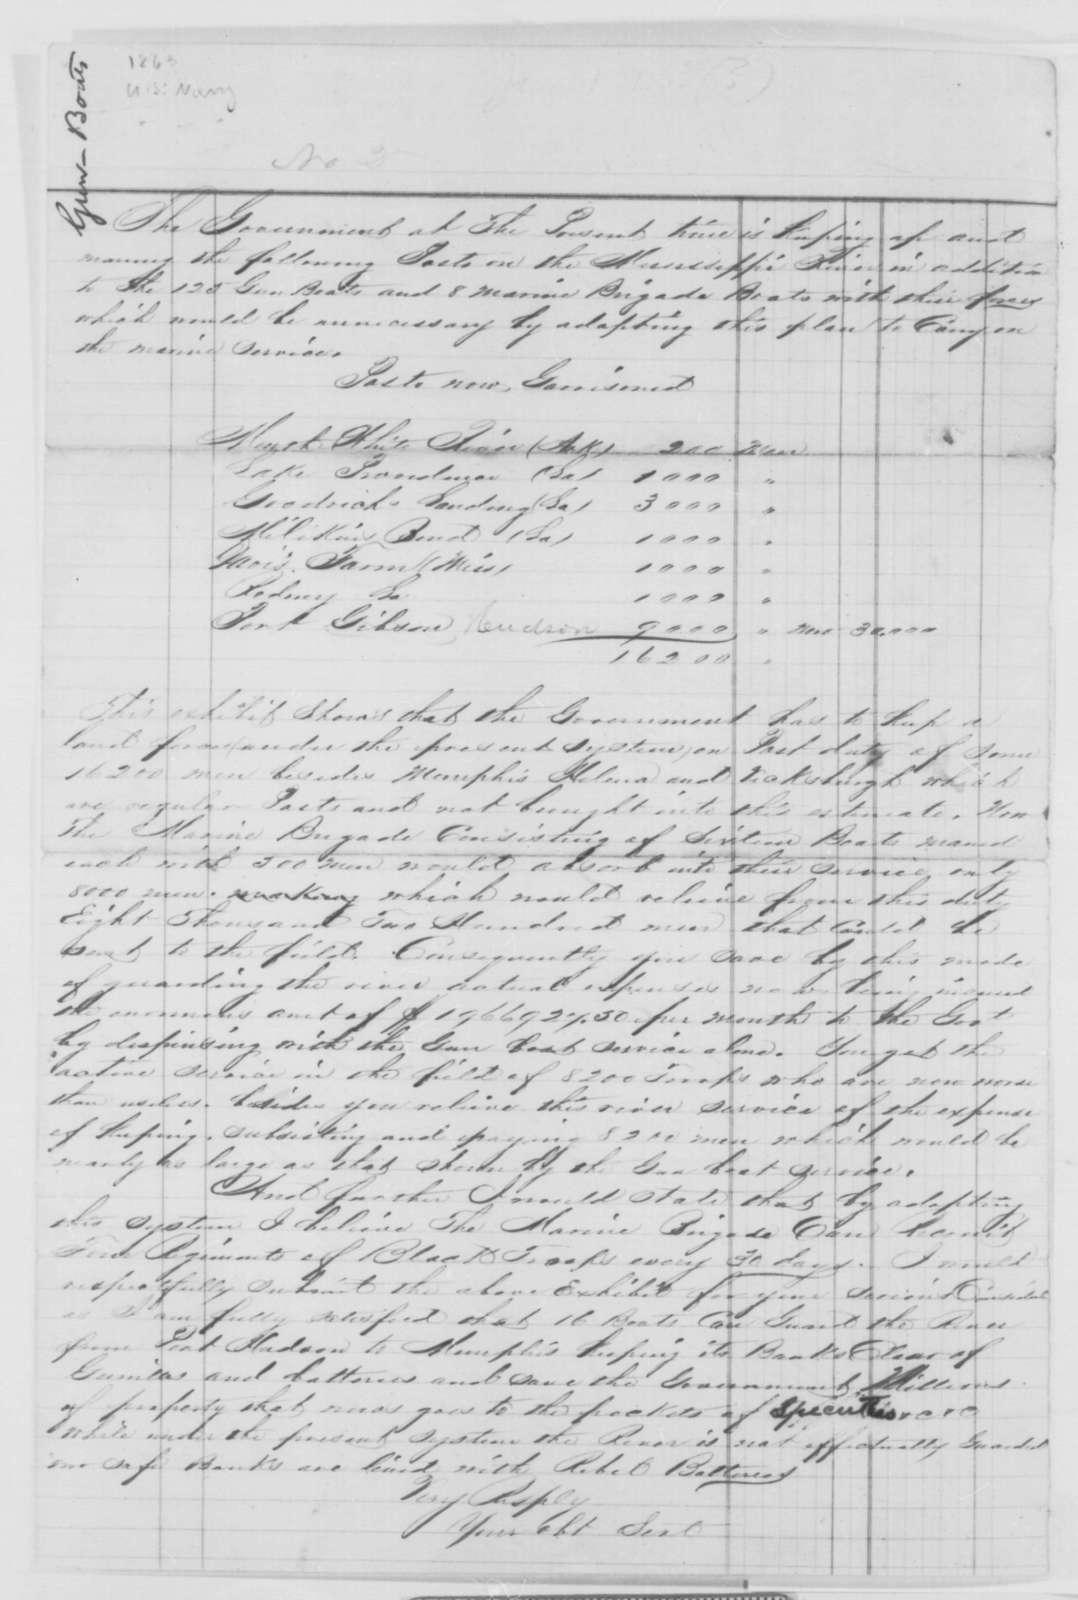 Navy Department,  1863  (Report on gunboats)